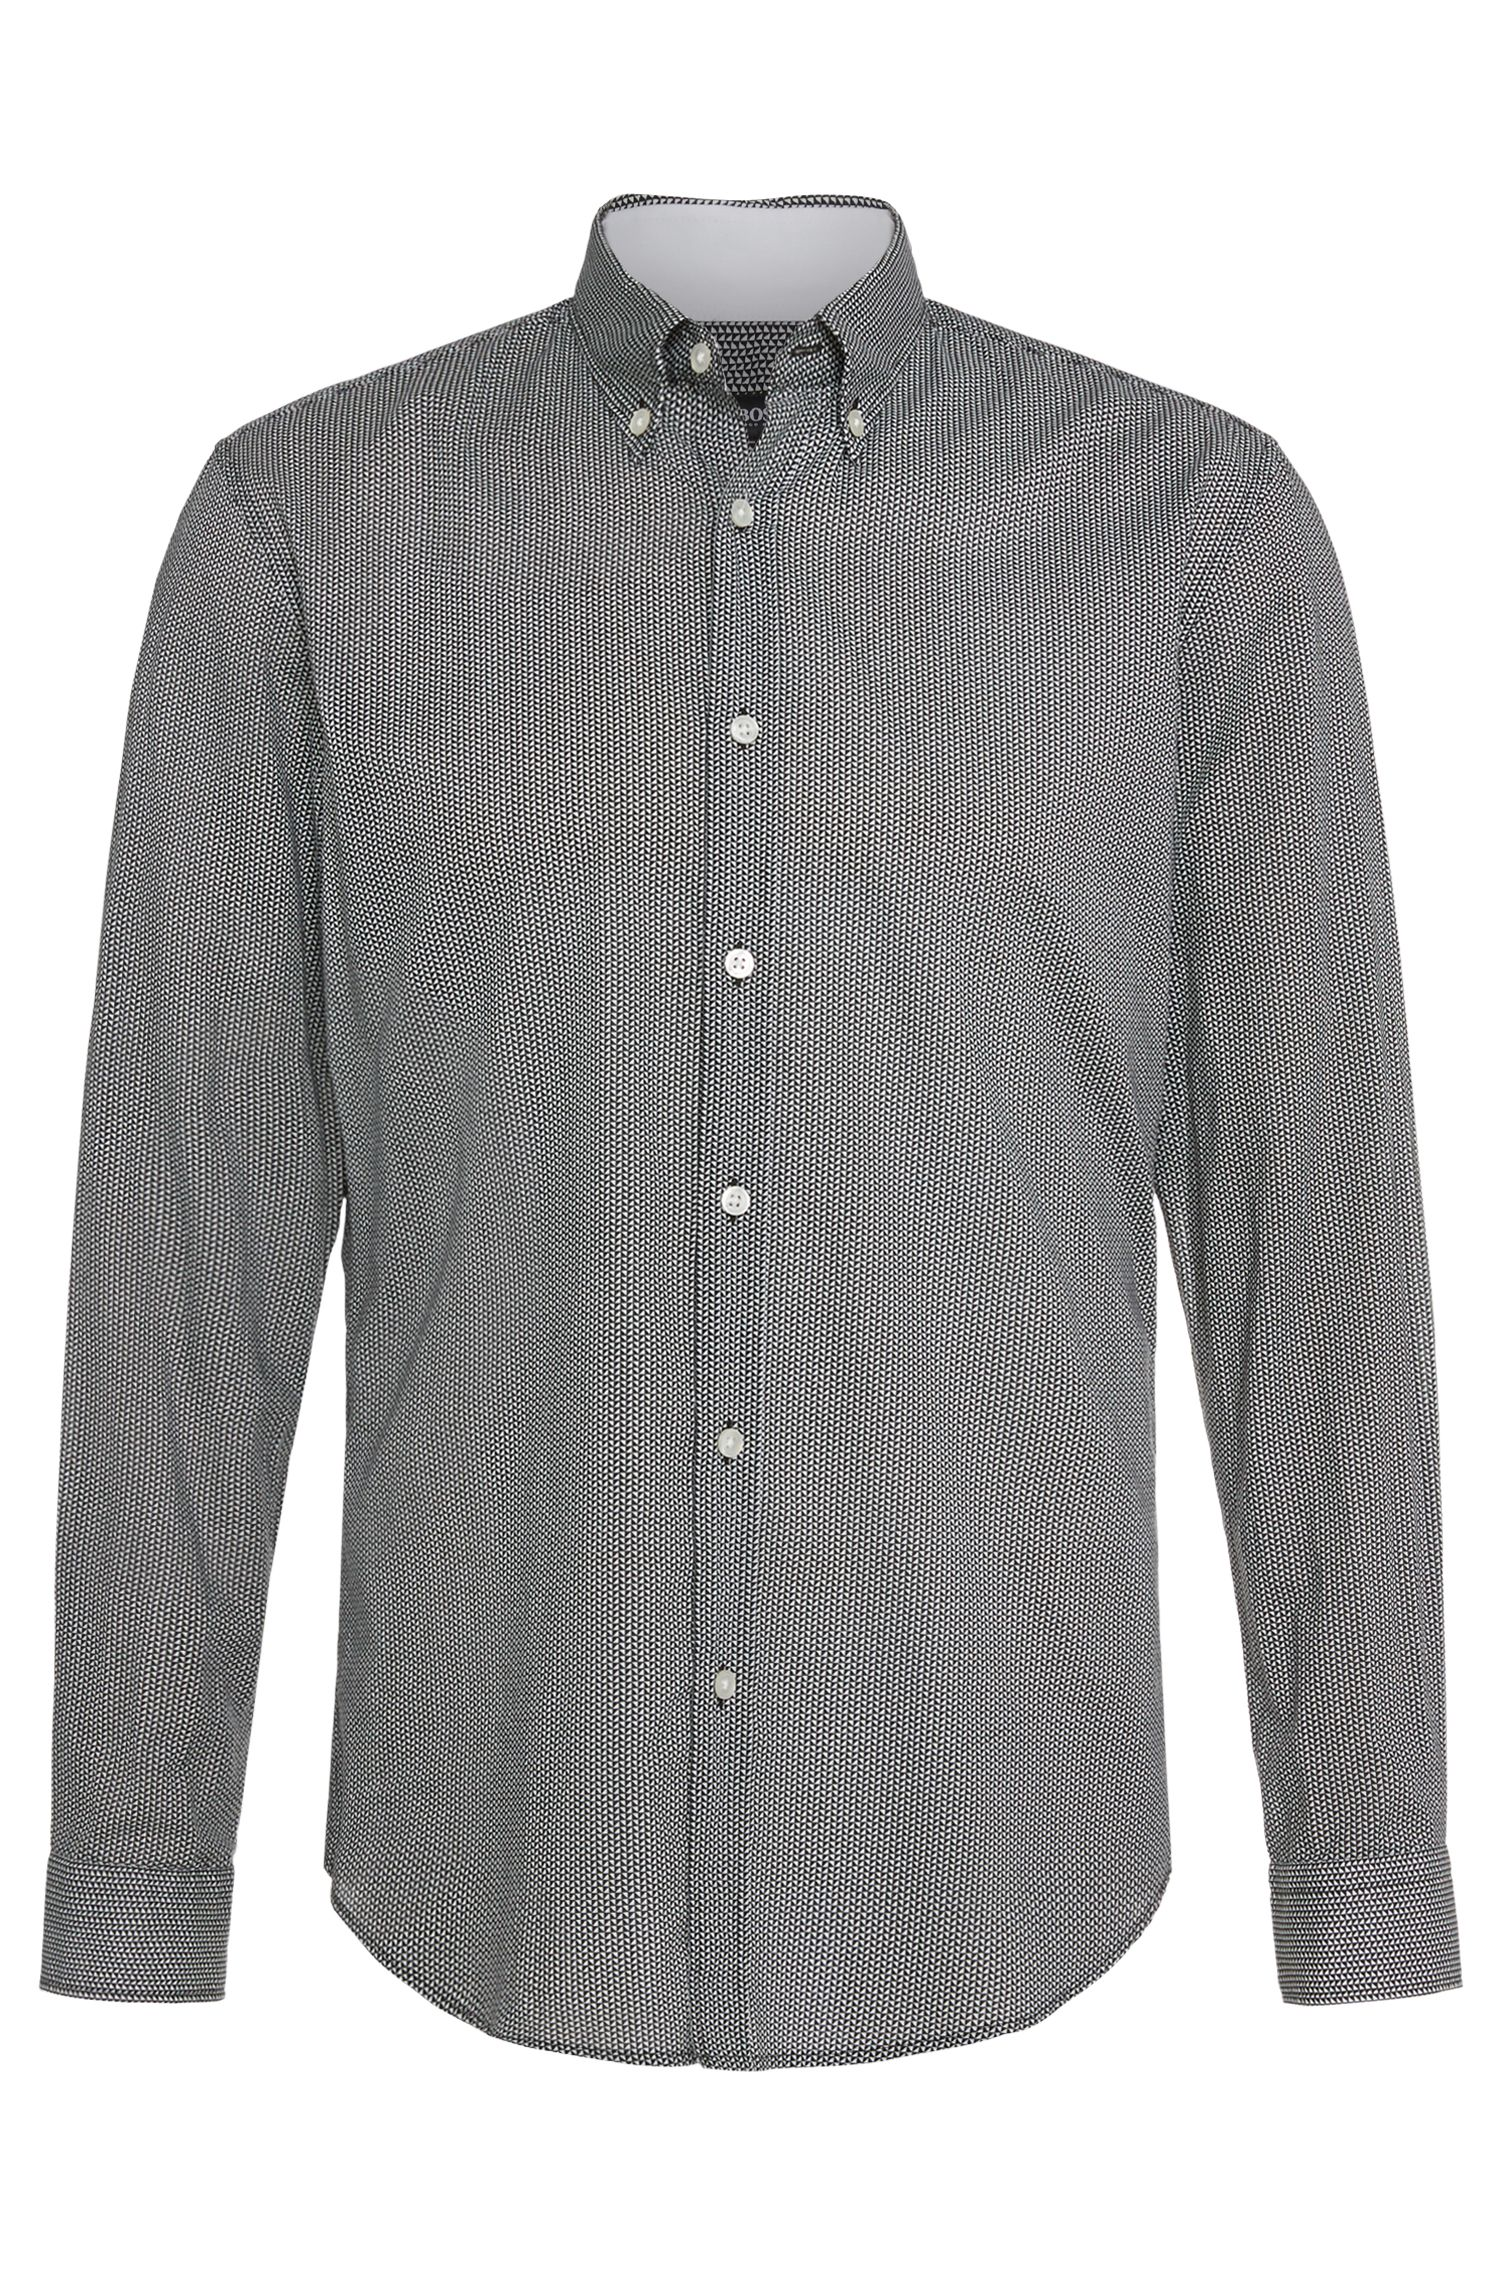 'Rod' | Slim Fit, Cotton Geo Print Button Down Shirt